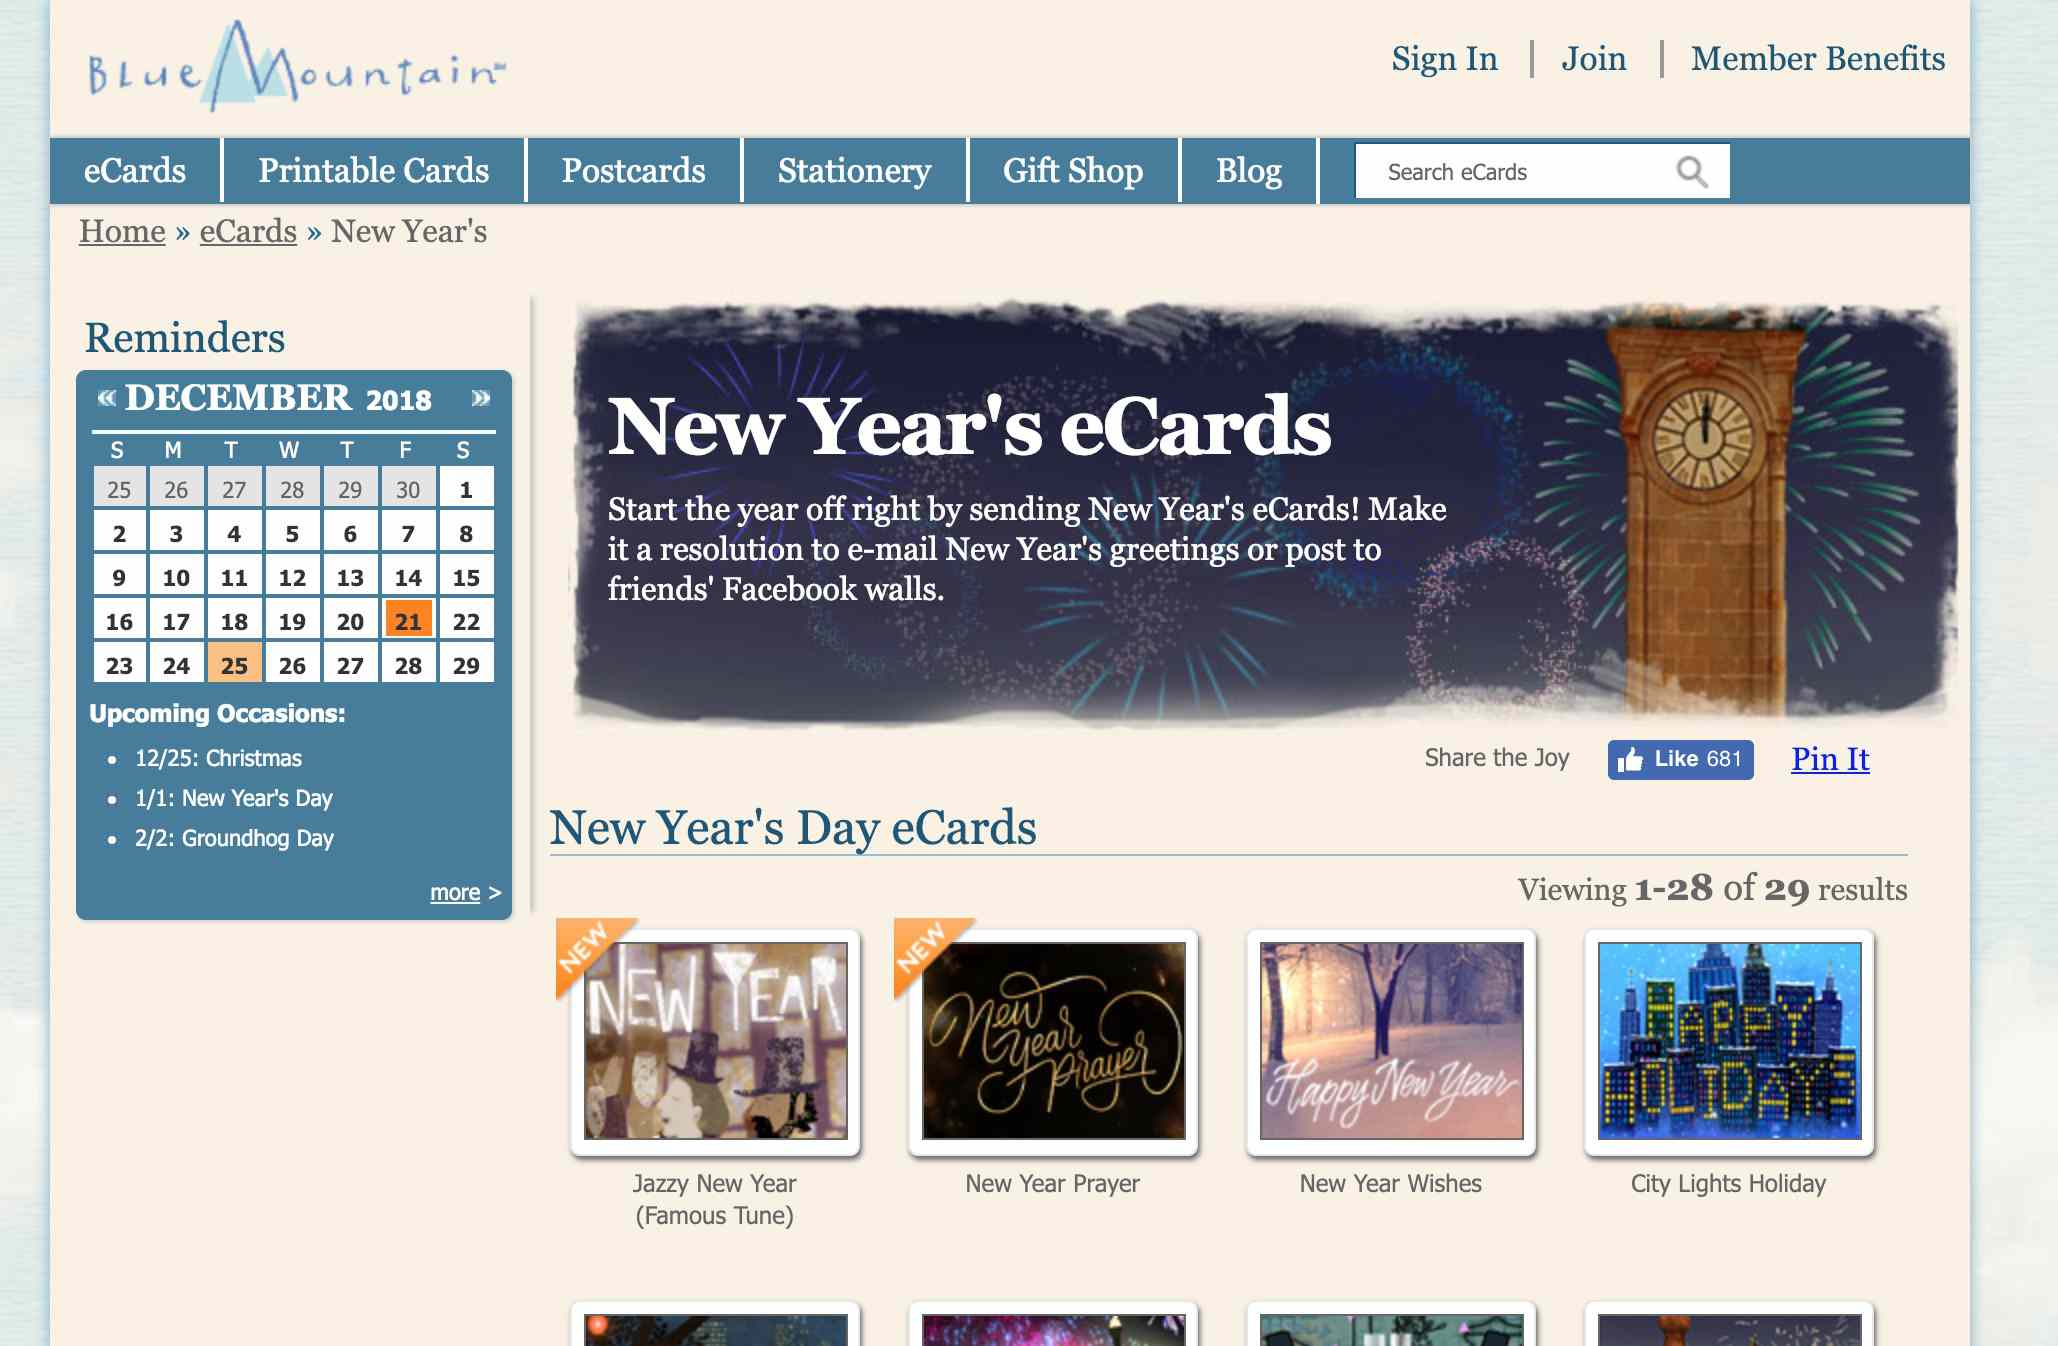 Blue Mountain website